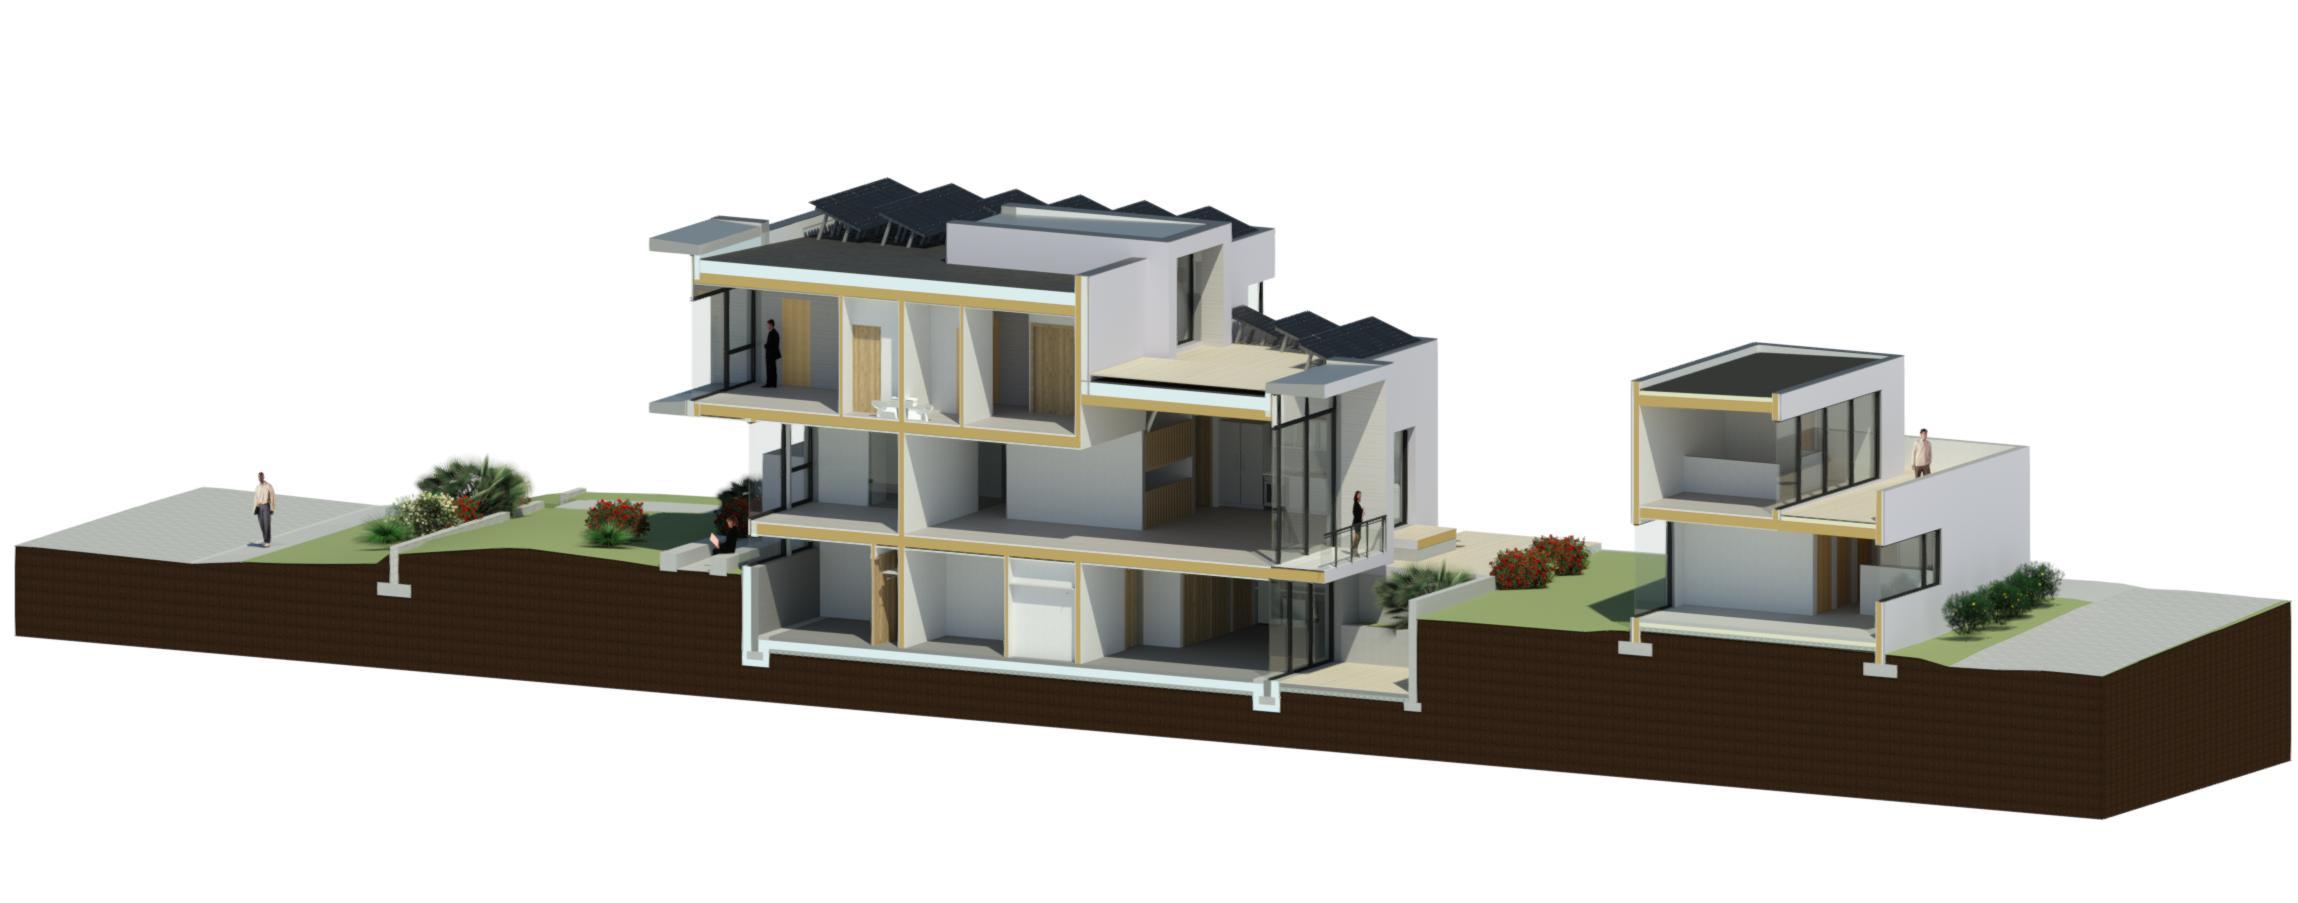 Vranakis Passive House